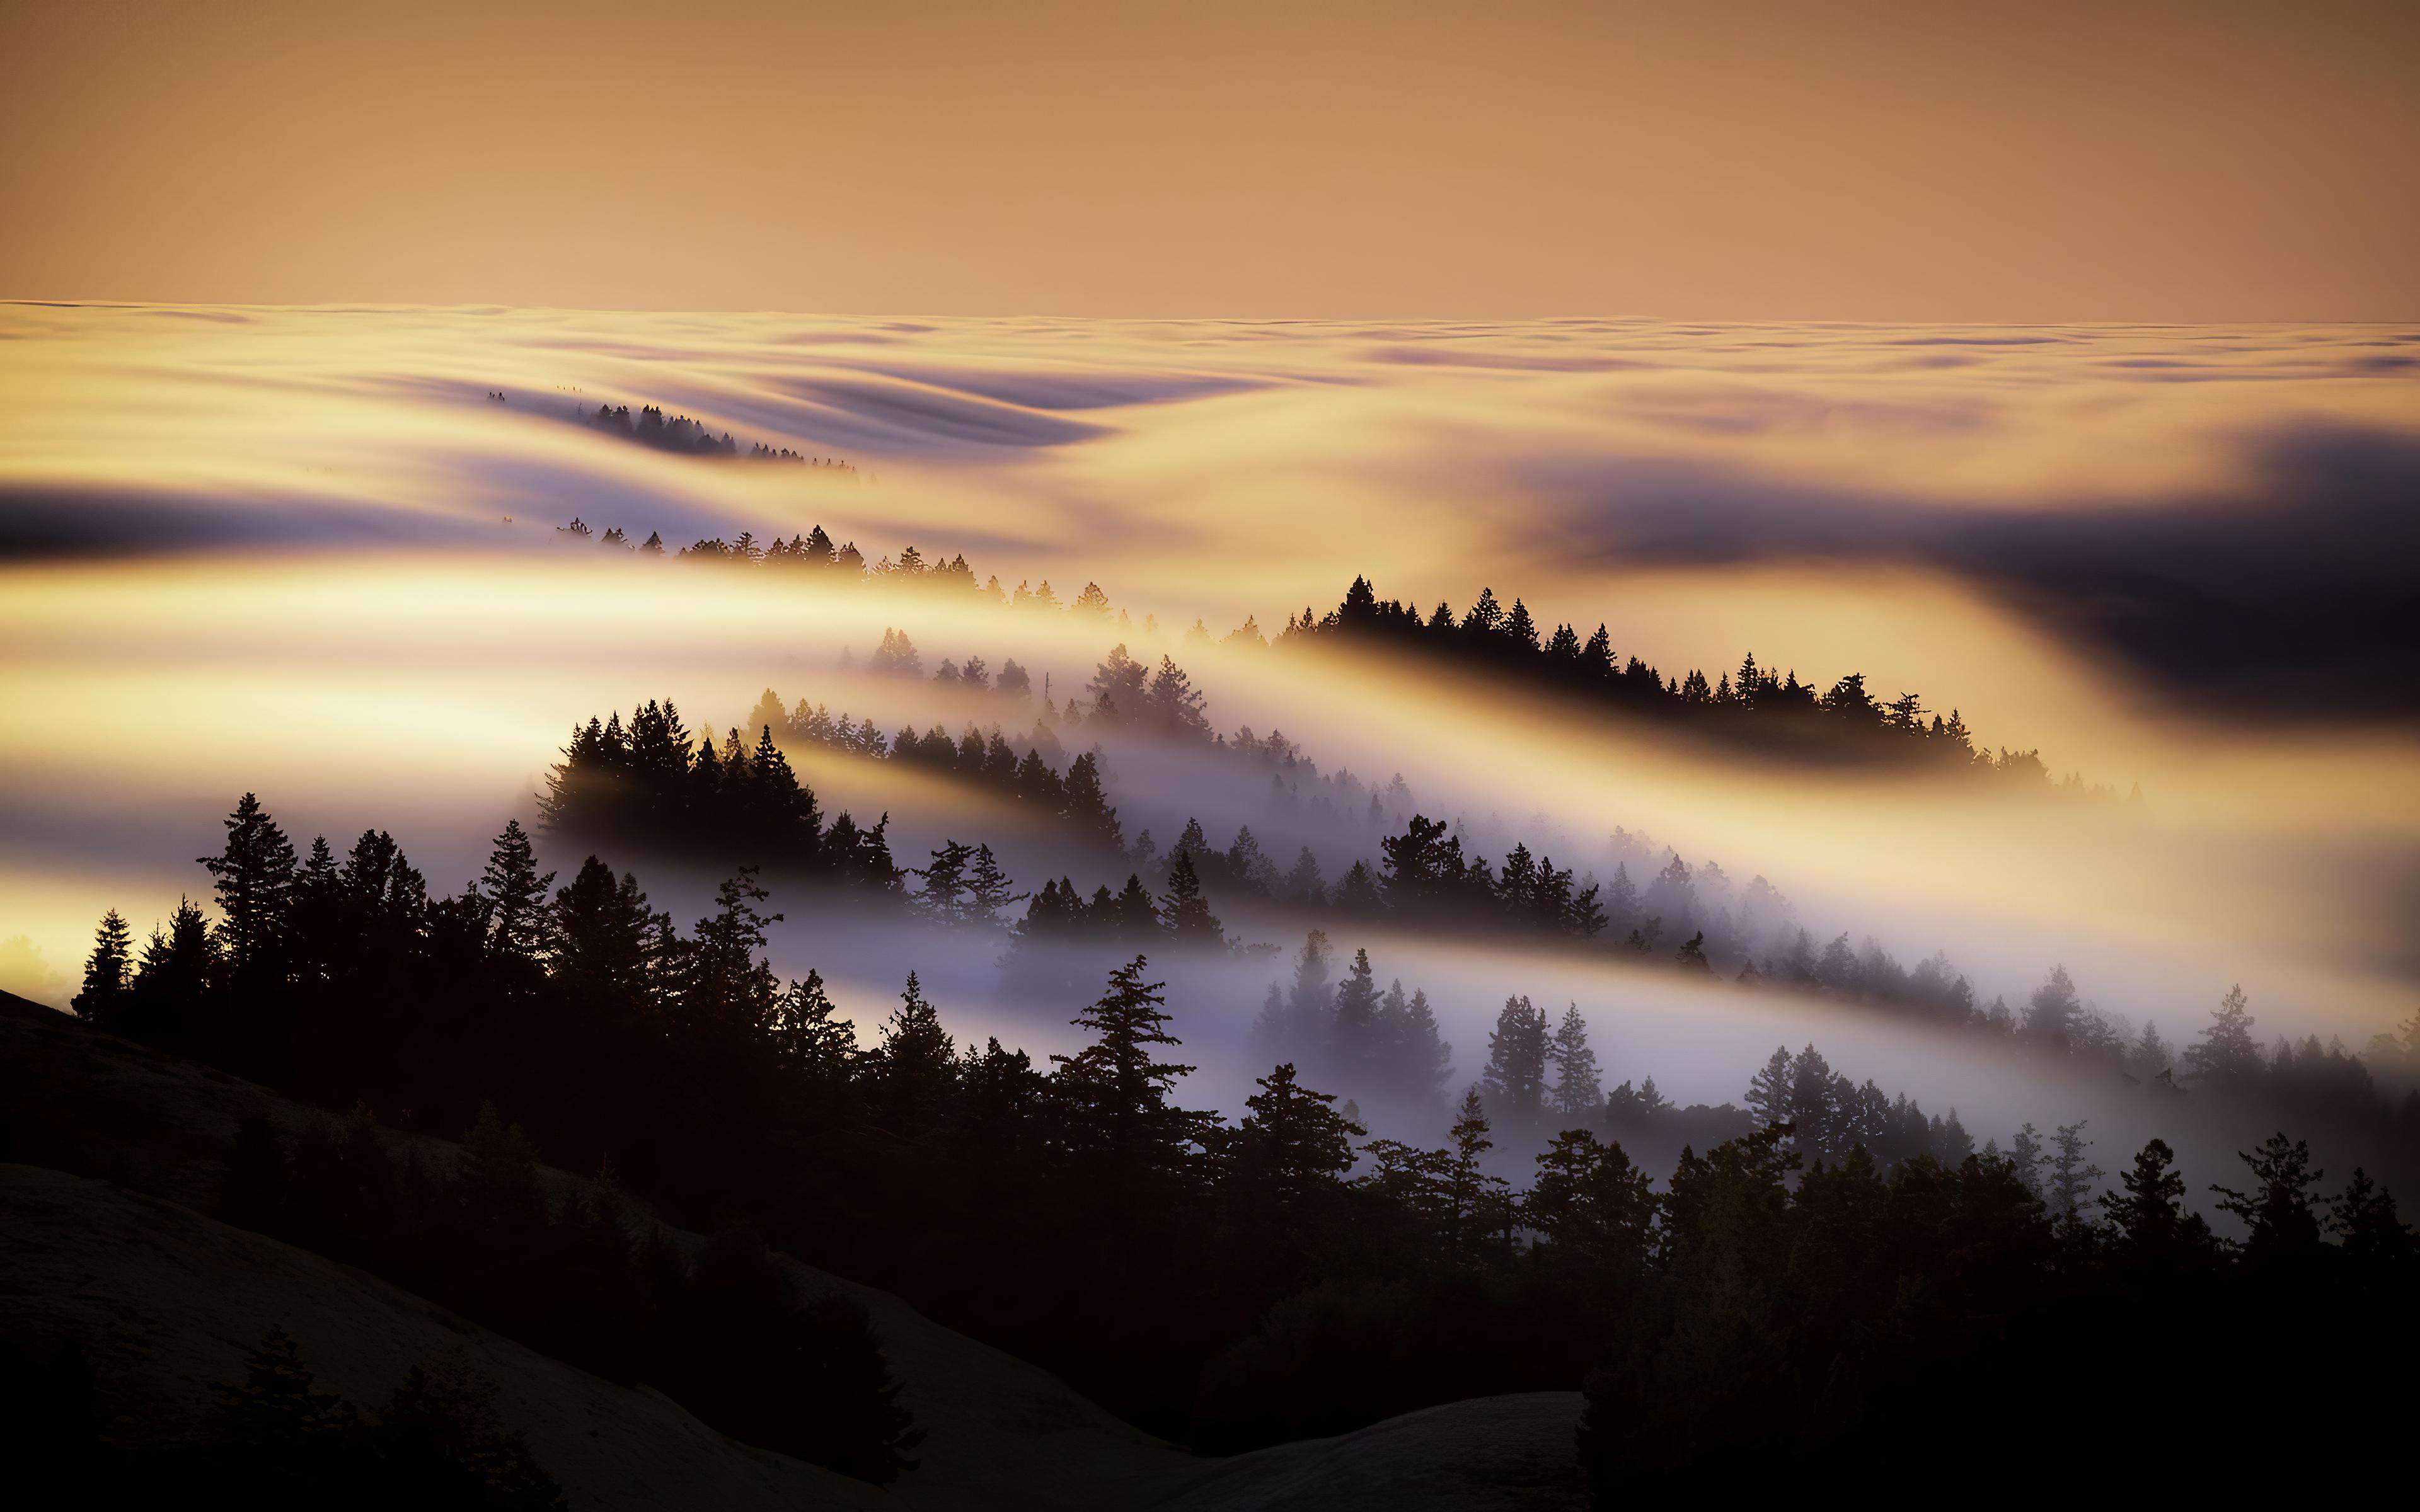 marin county mist morning 4k 1602606181 - Marin County Mist Morning 4k - Marin County Mist Morning 4k wallpapers